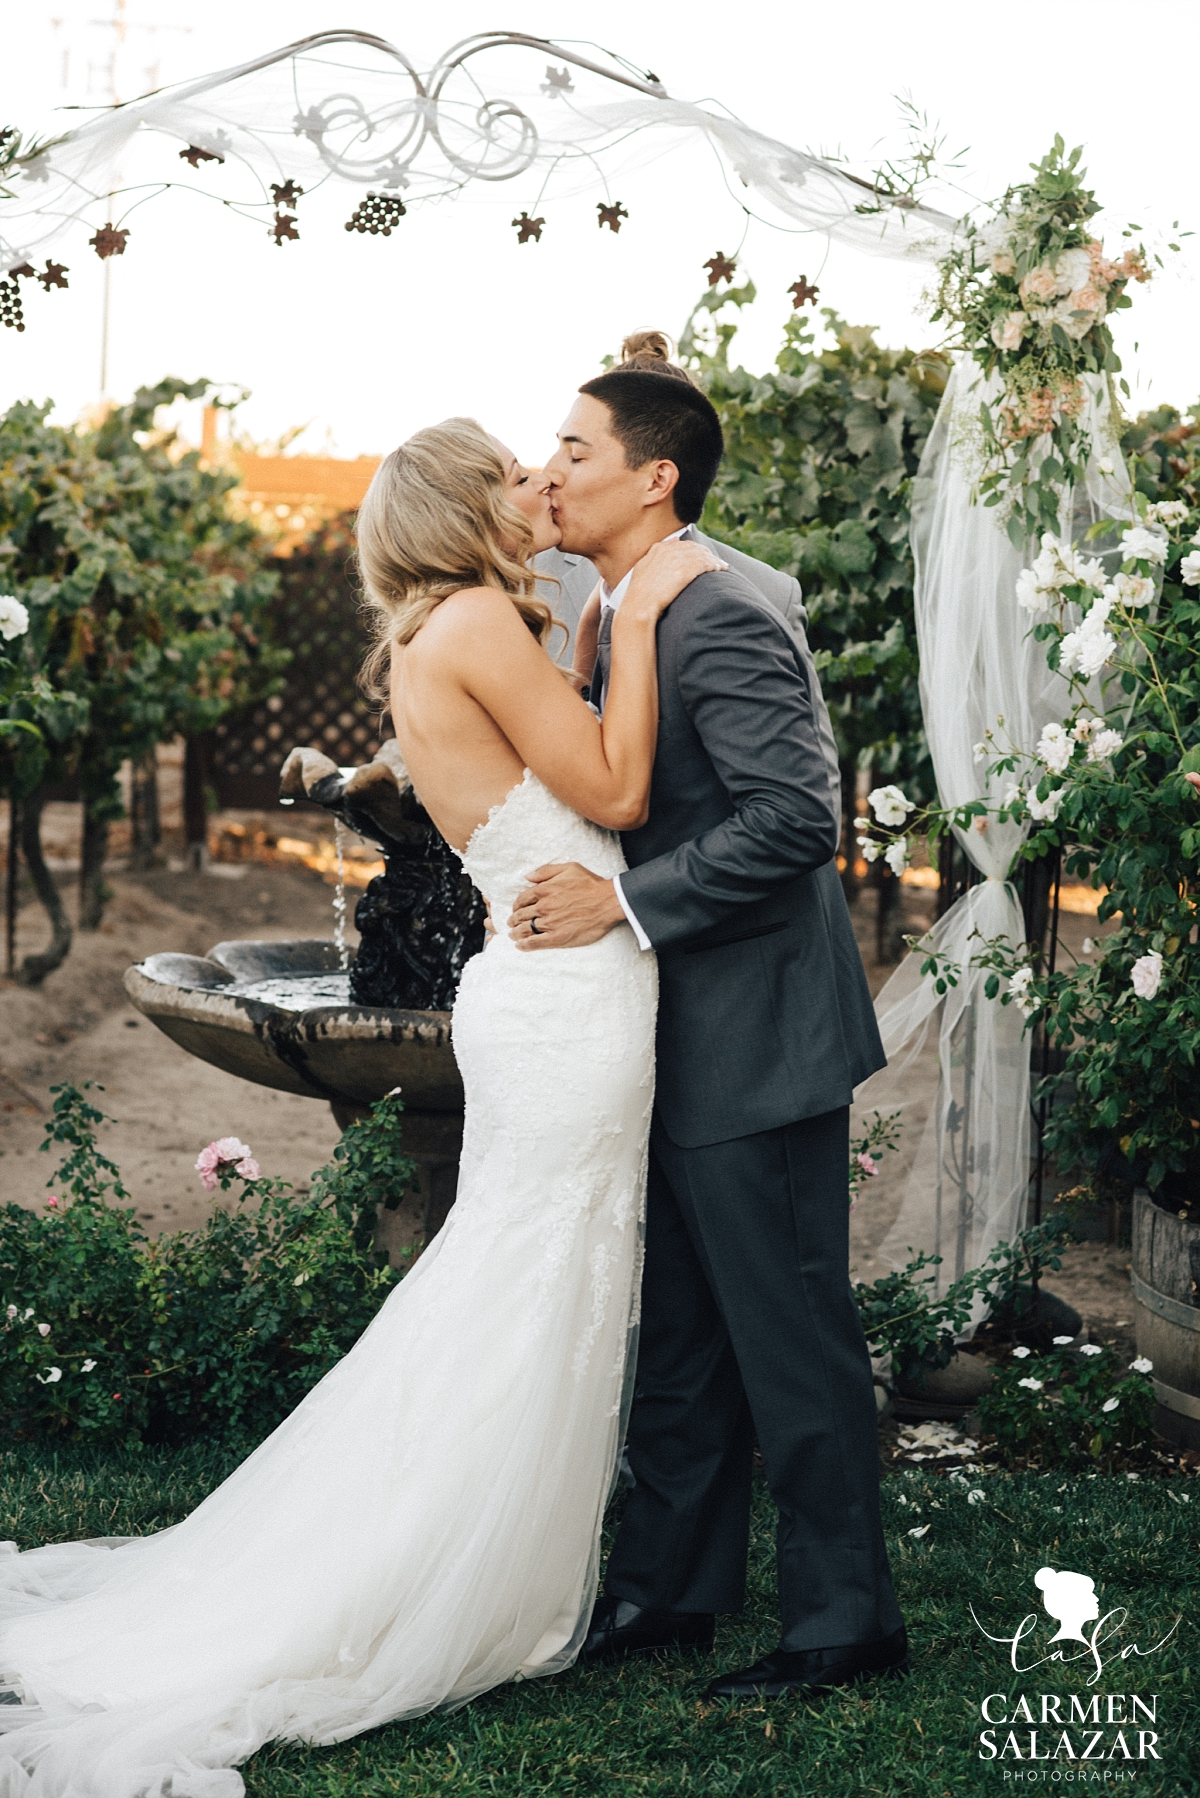 Bride and groom first kiss at Scribner Bend ceremony - Carmen Salazar